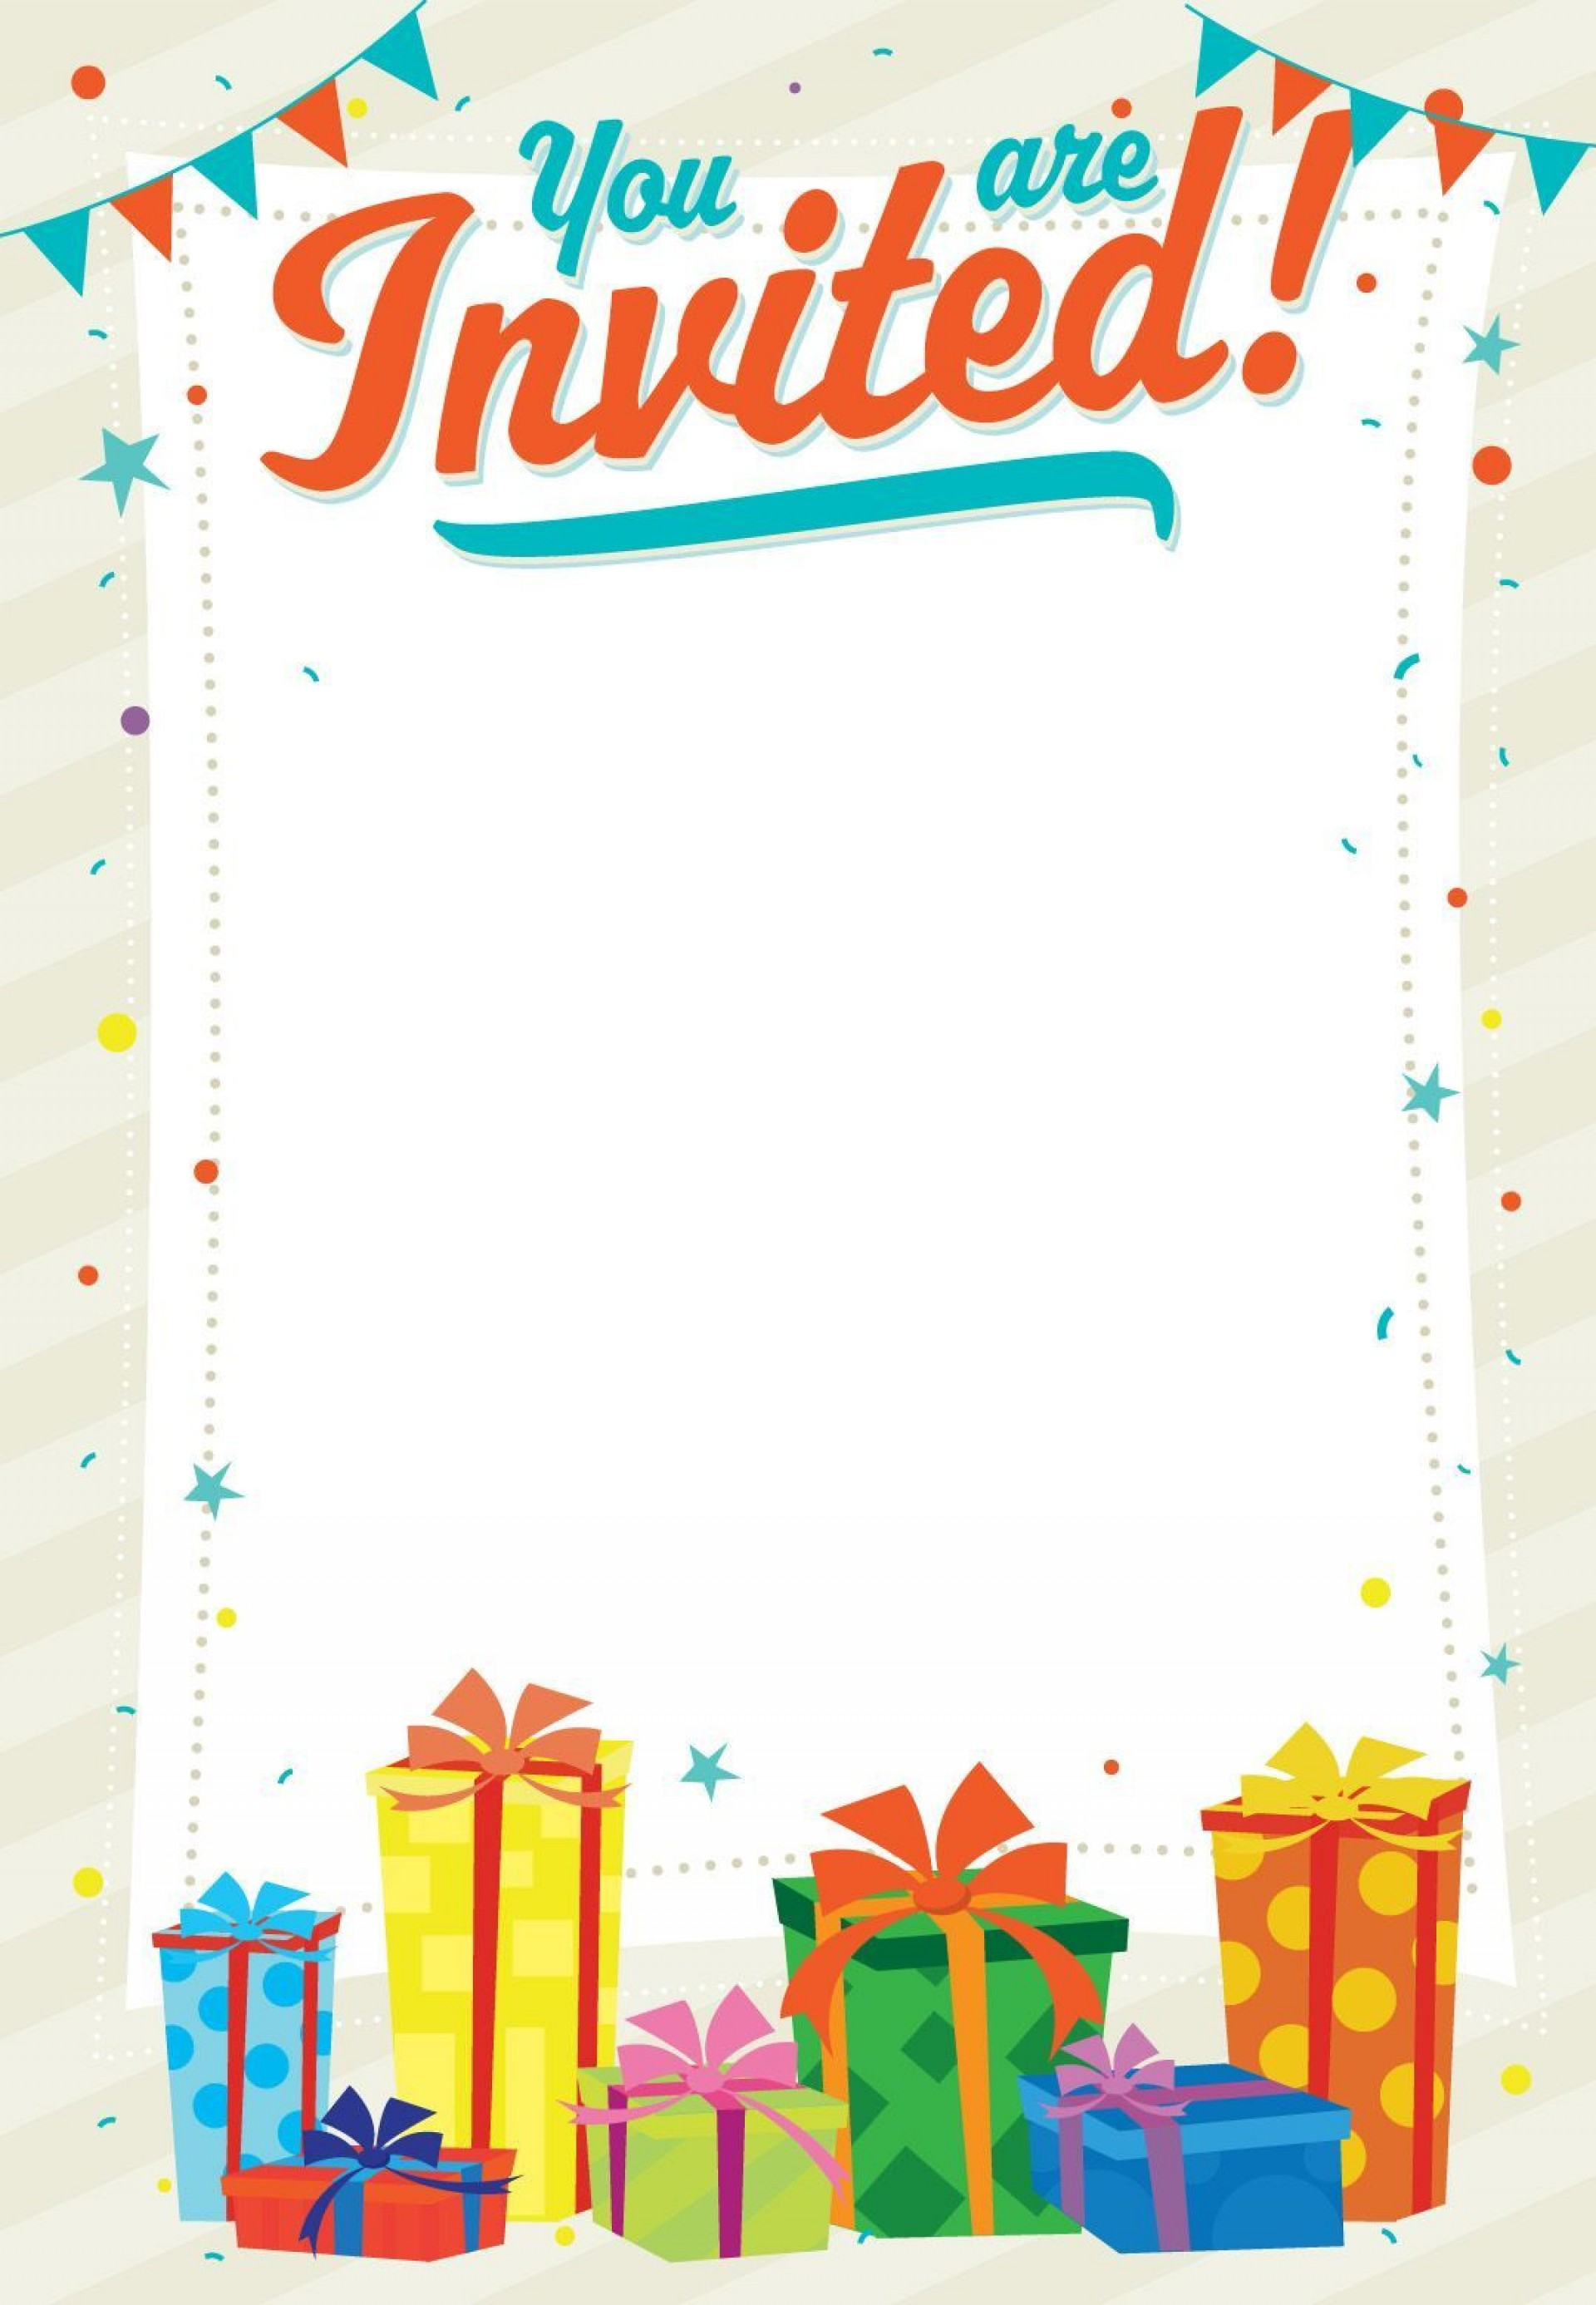 001 Sensational Birthday Card Template Free Concept  Invitation Photoshop Download Word1920